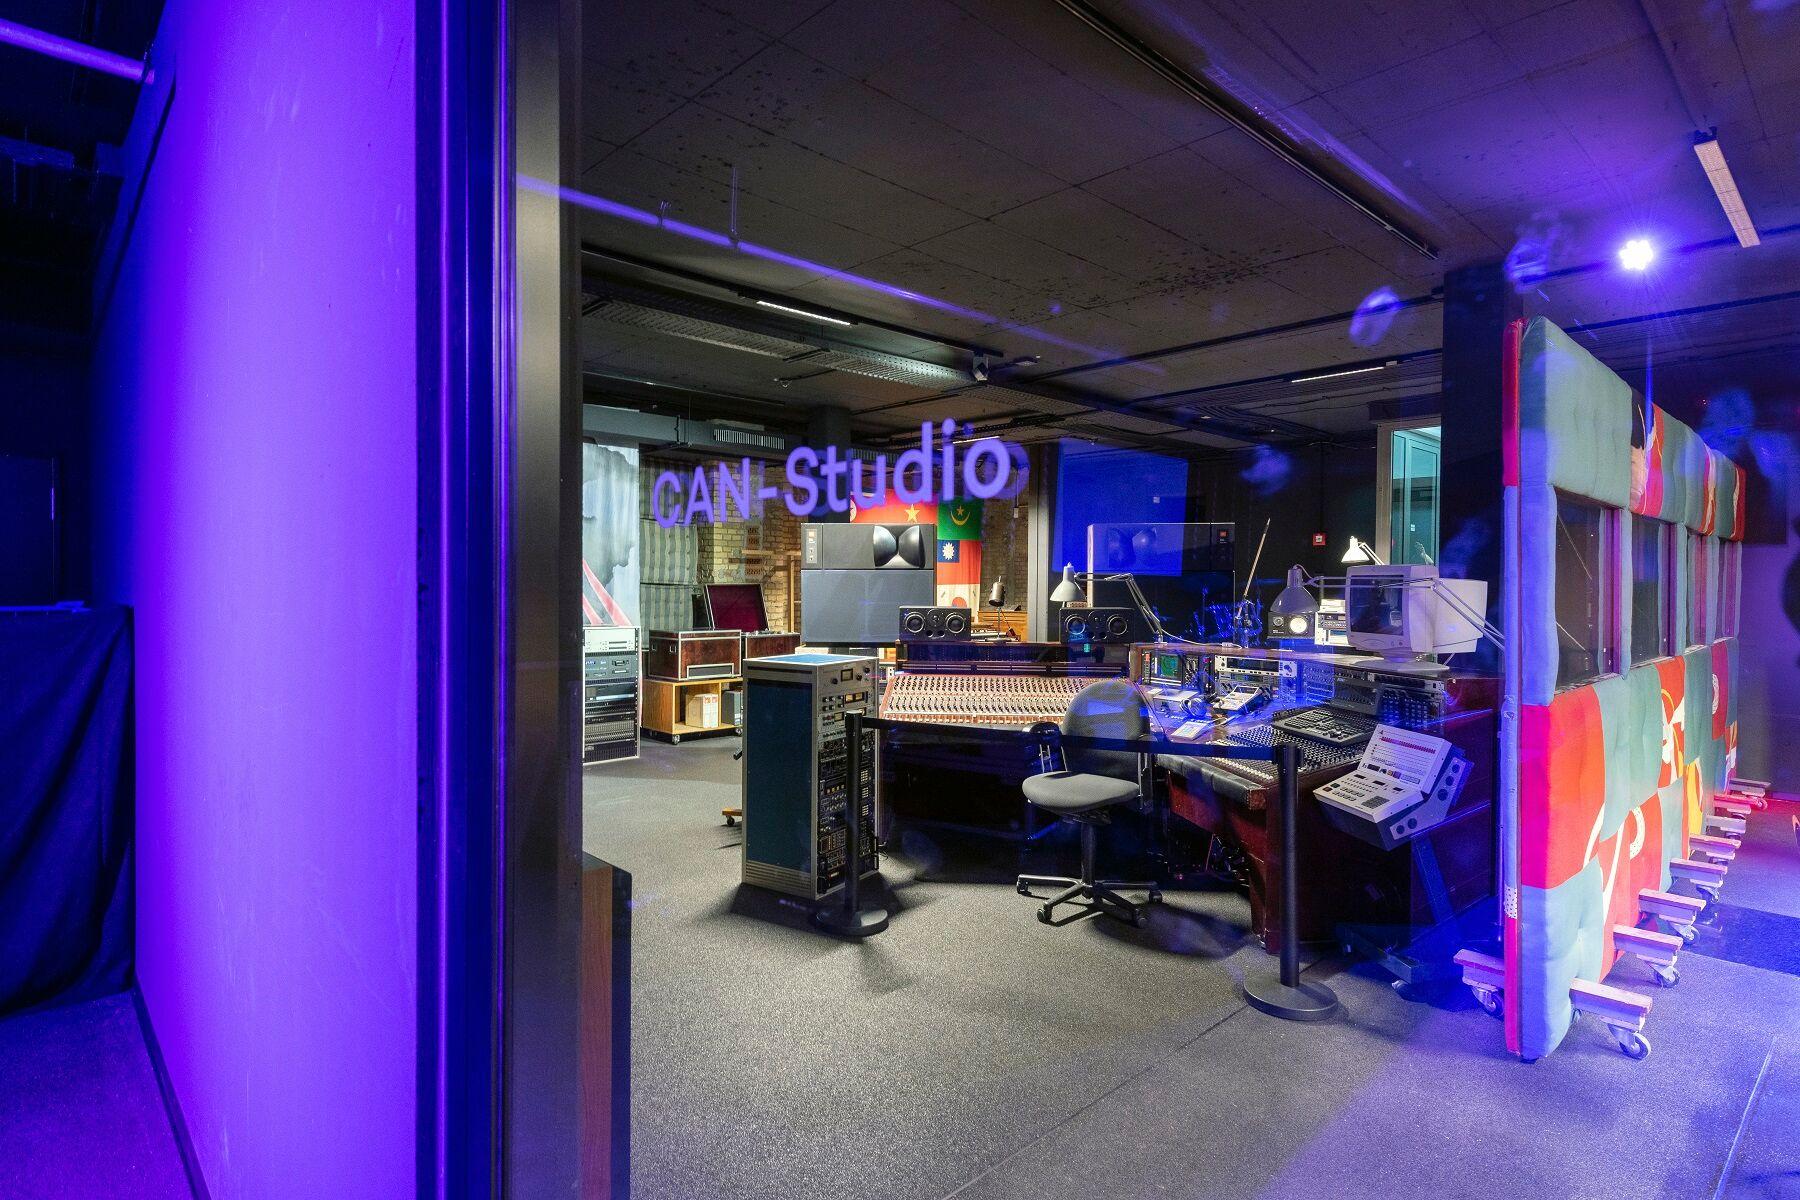 CAN-Studio